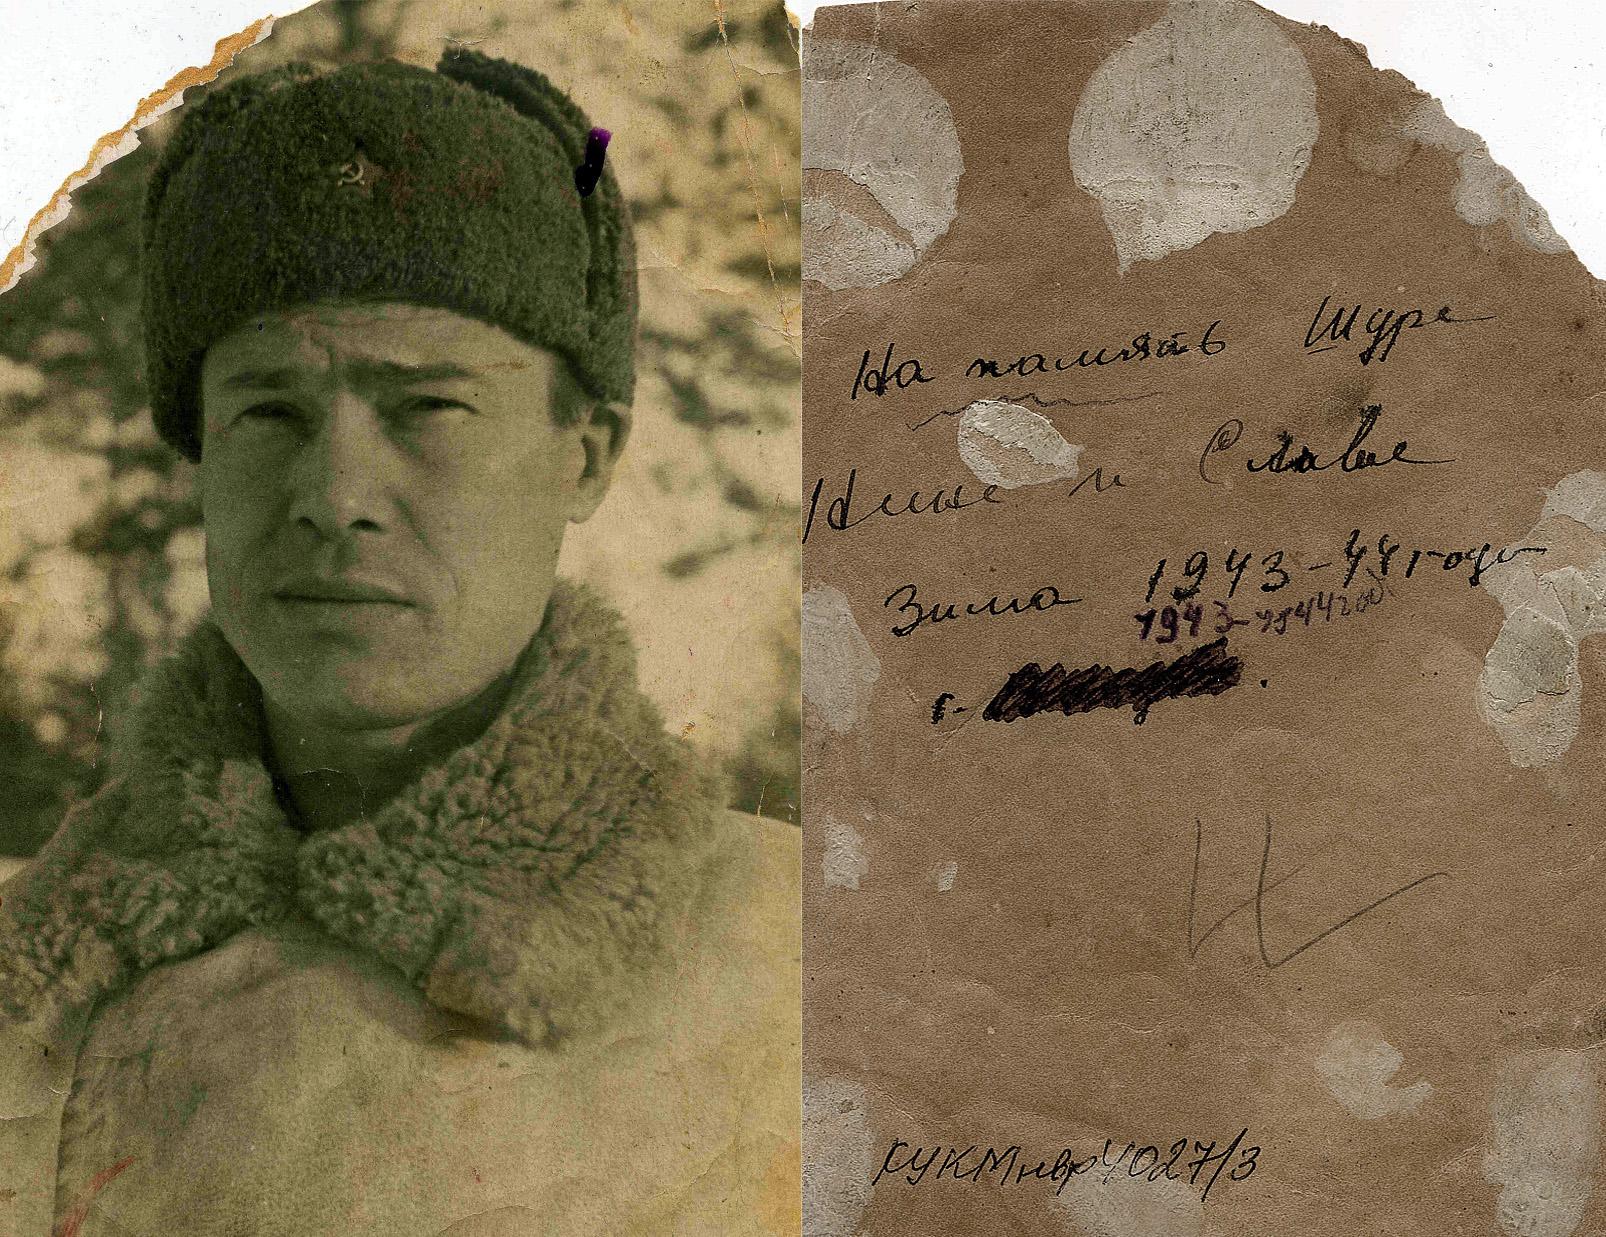 ded-1943